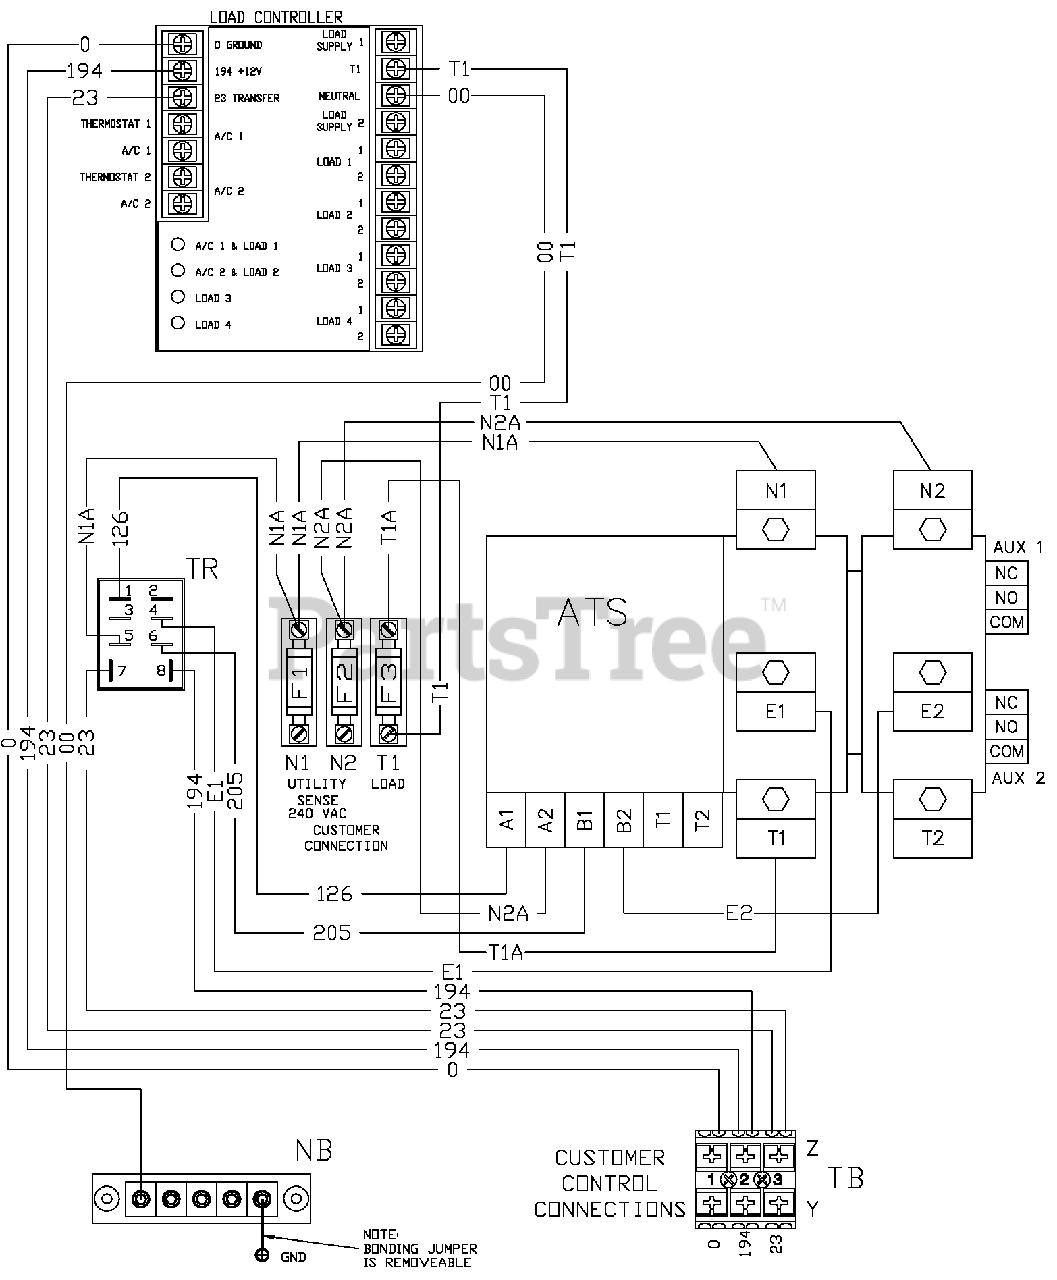 generac engine wiring diagram generac rtsr400a3s generac power transfer switch  sn 8438566  generac power transfer switch